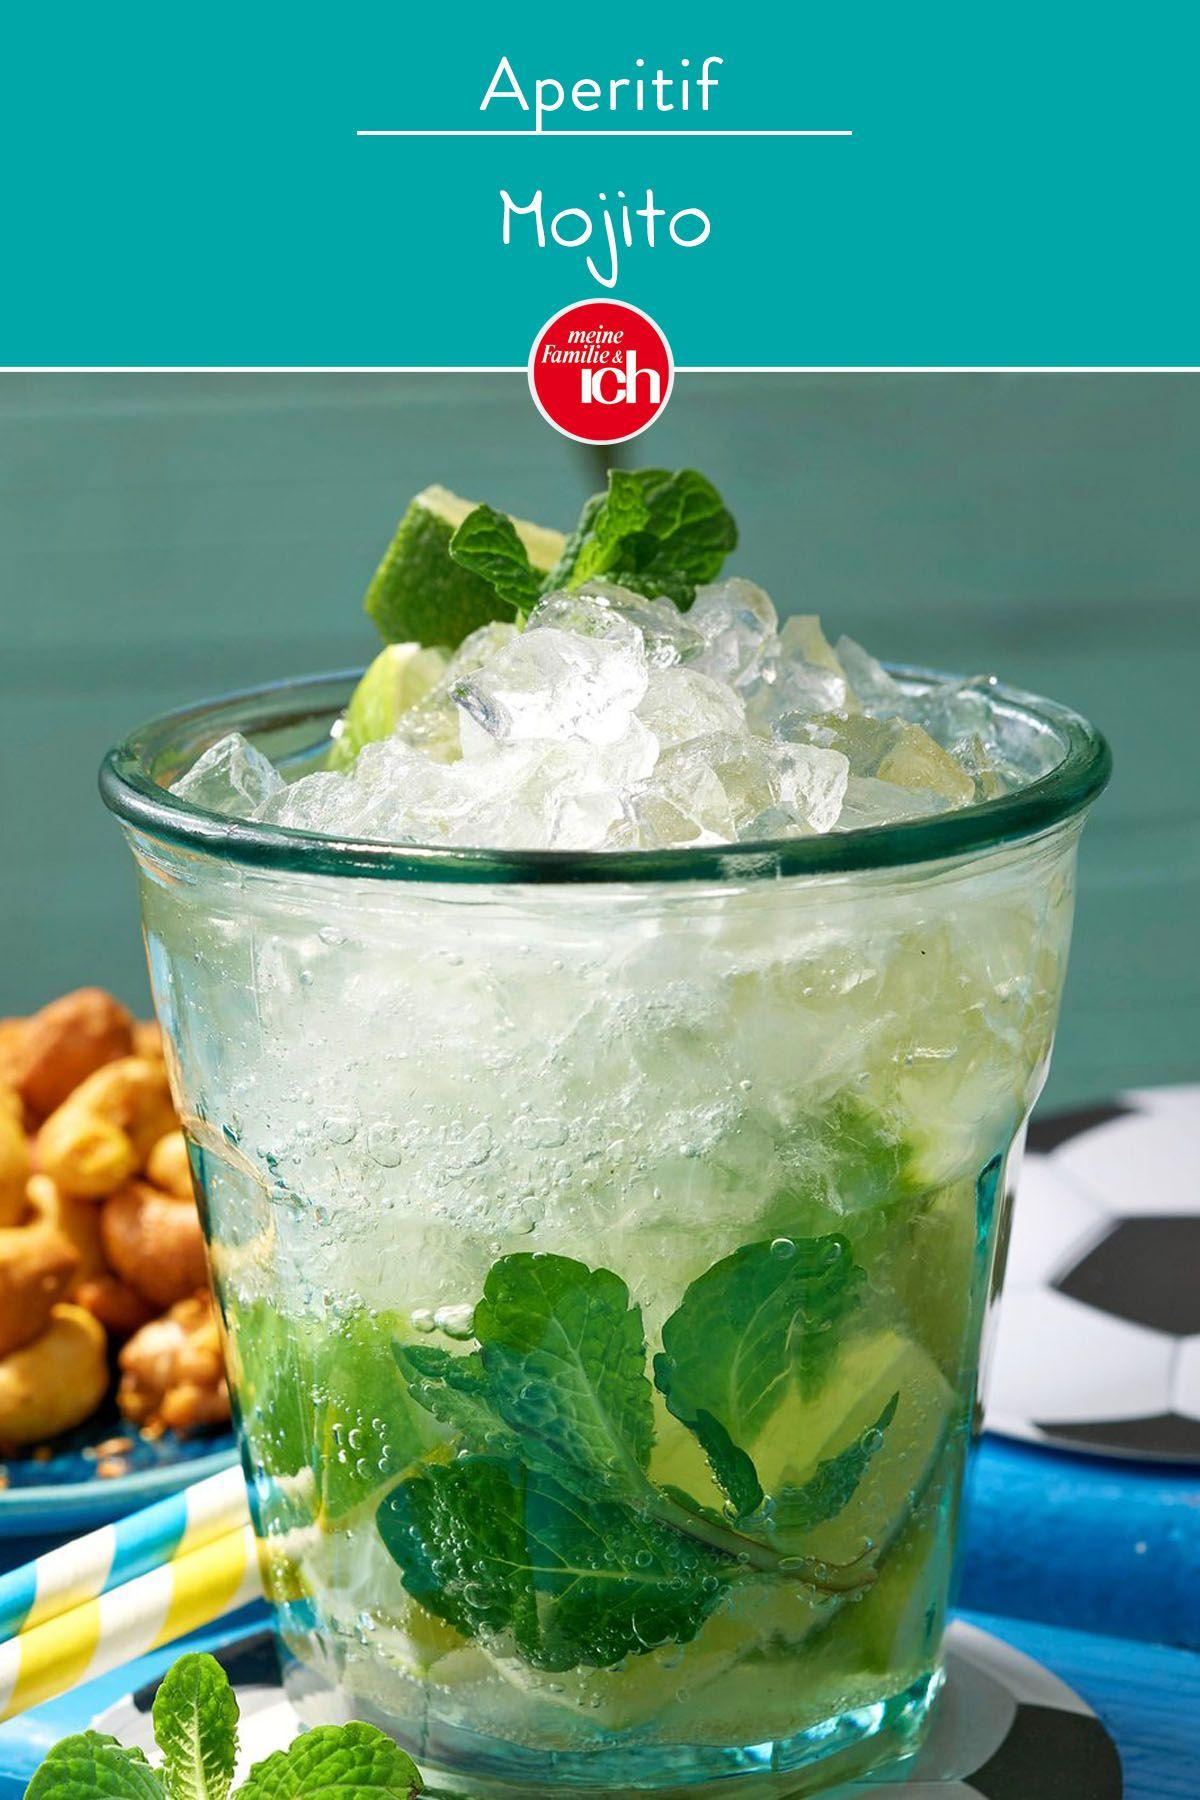 Mojito Klassisches Rezept Meine Familie Ich Europas Grosstes Foodmagazin Rezept Cocktails Mit Minze Mojito Rum Cocktails